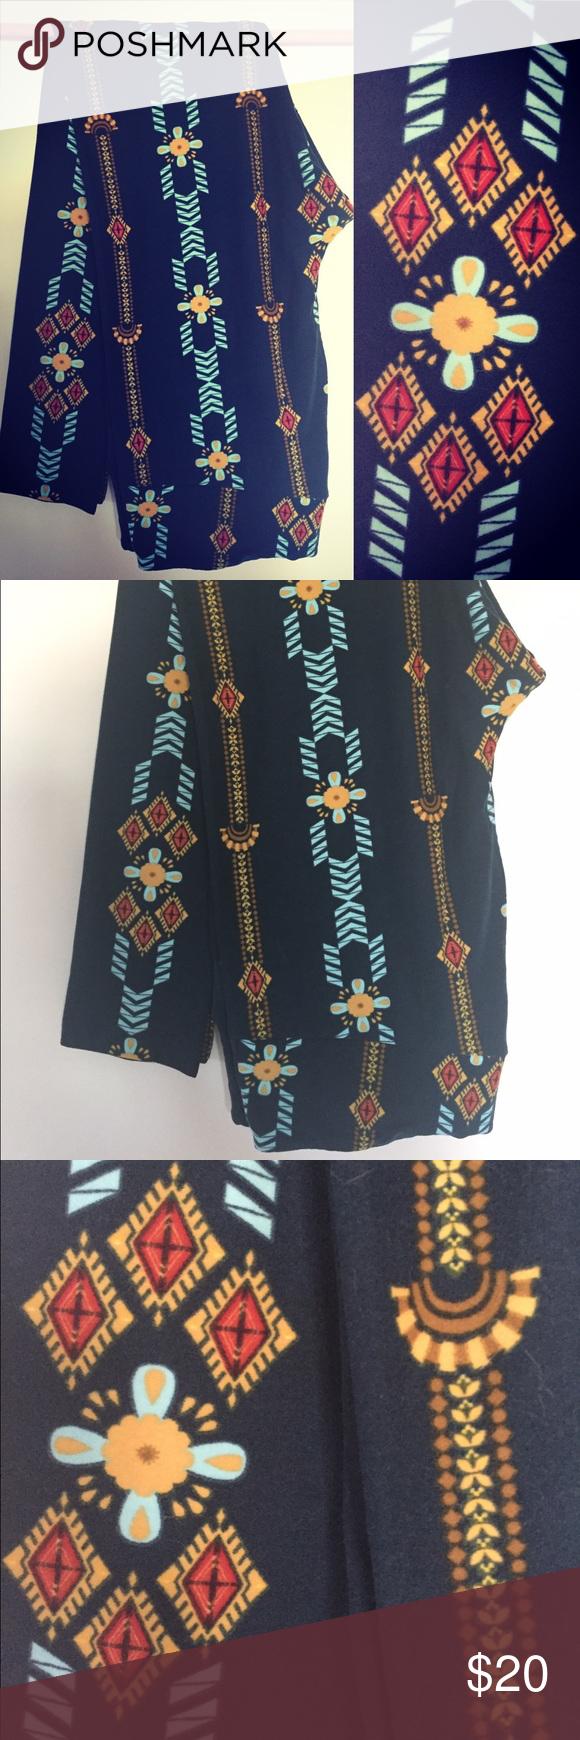 ca22302b53a3fc LuLaRoe TC Blue Aztec Print Leggings EUC Buttery soft LuLaRoe leggings with  blue Aztec print. Only worn twice. Washed per LLR standards.